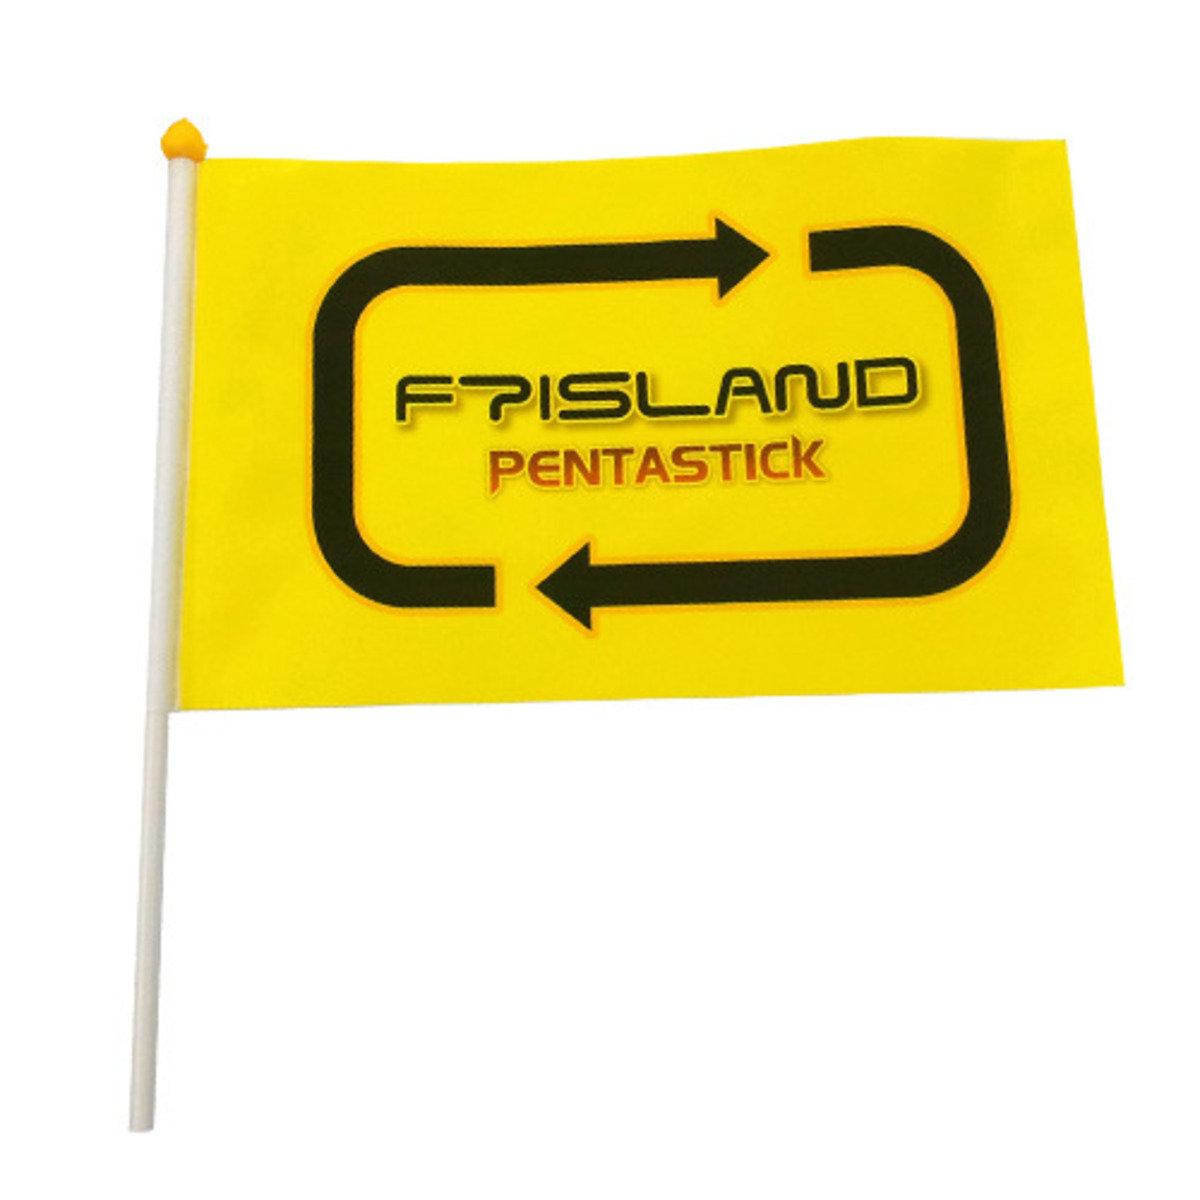 FTISLAND - 應援旗_40613